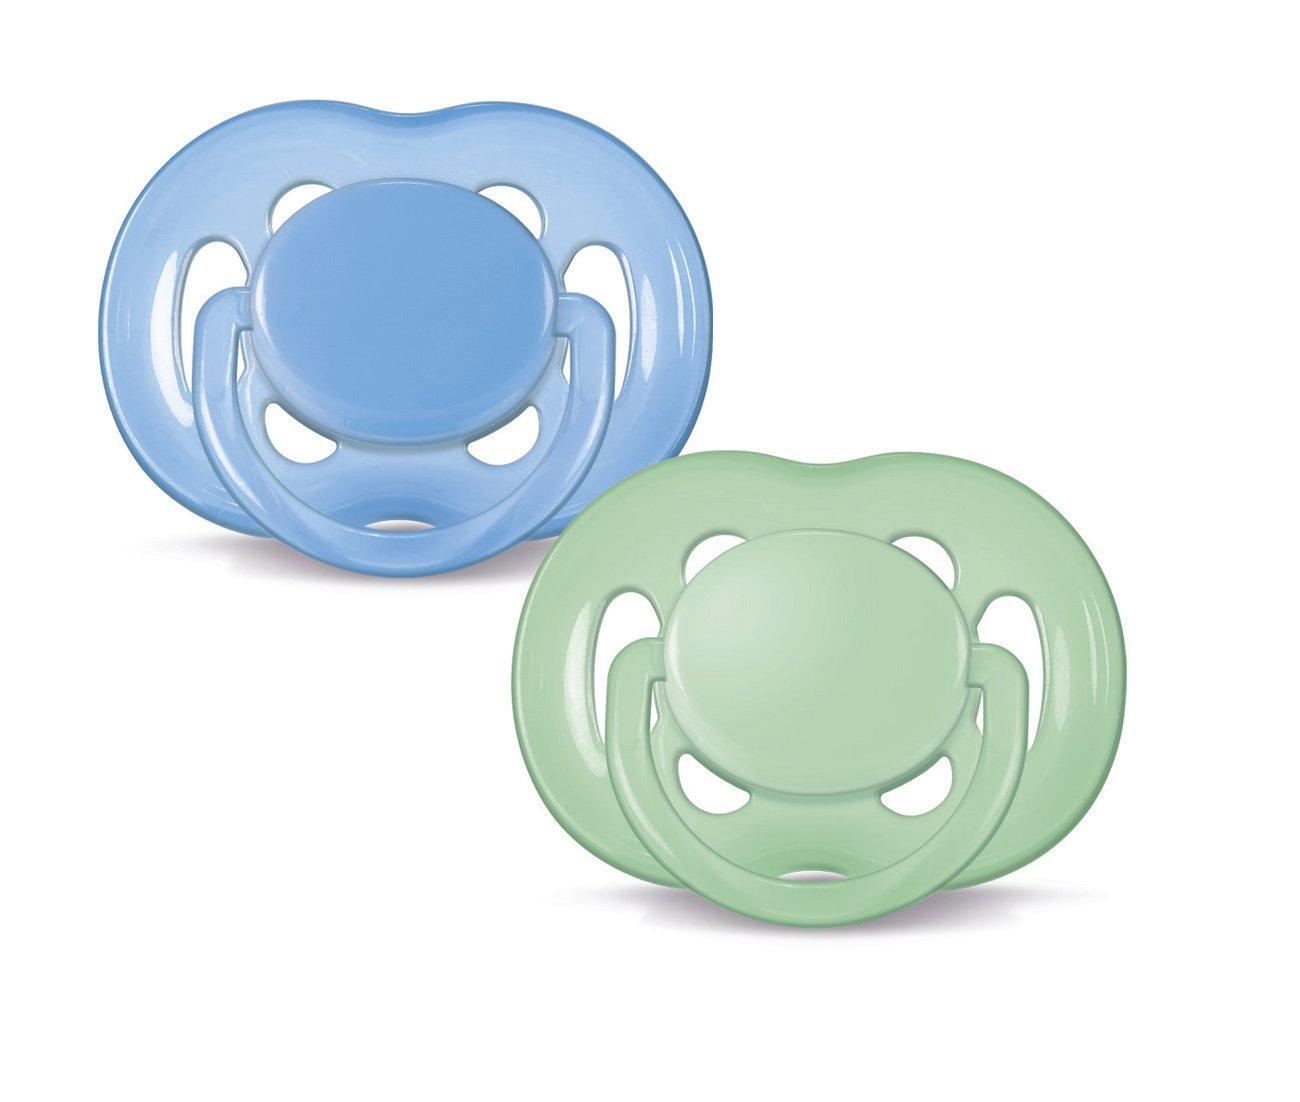 Amazon.com : Freeflow Chupete BPA, libre azul / verde, 6-18 Meses ...